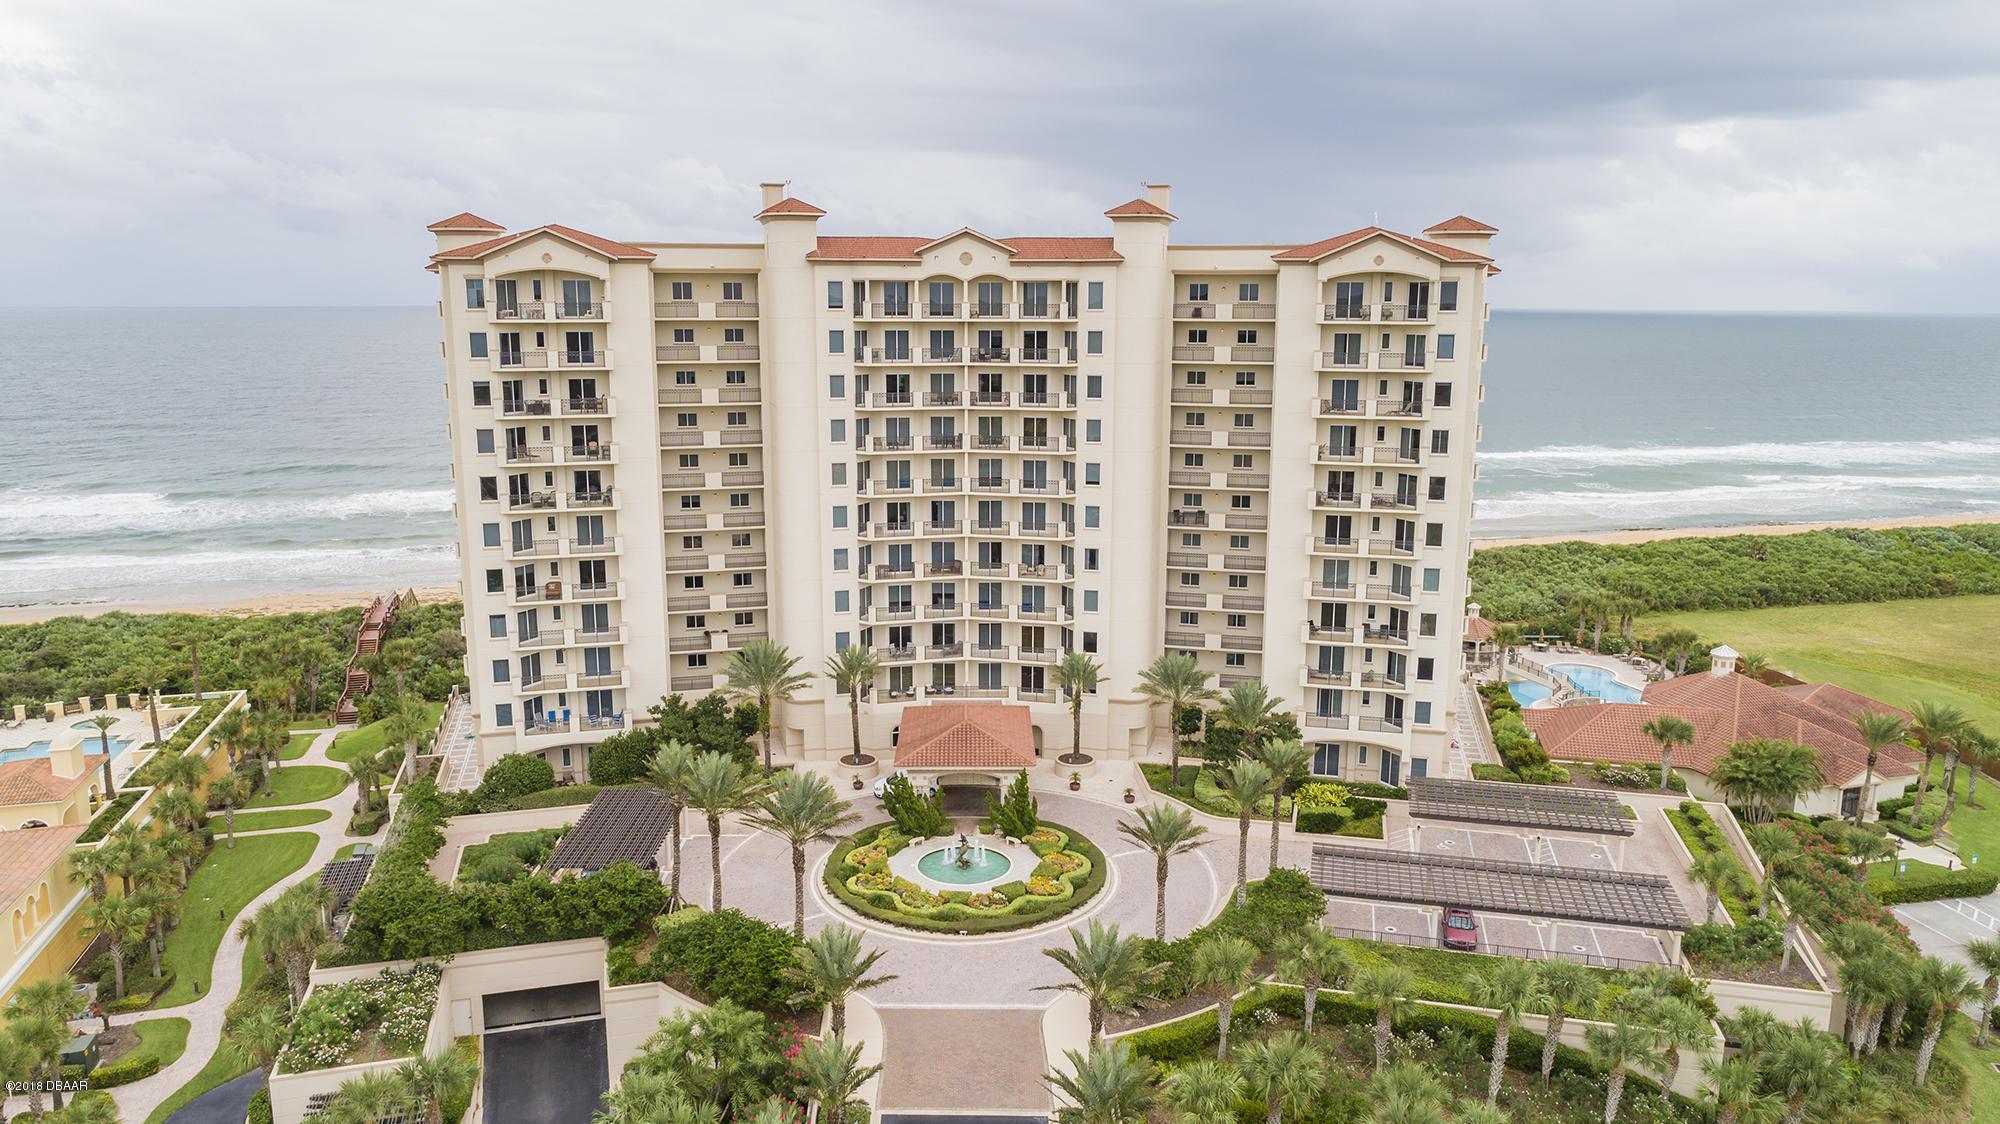 Photo of 85 Avenue De La Mer #302, Palm Coast, FL 32137